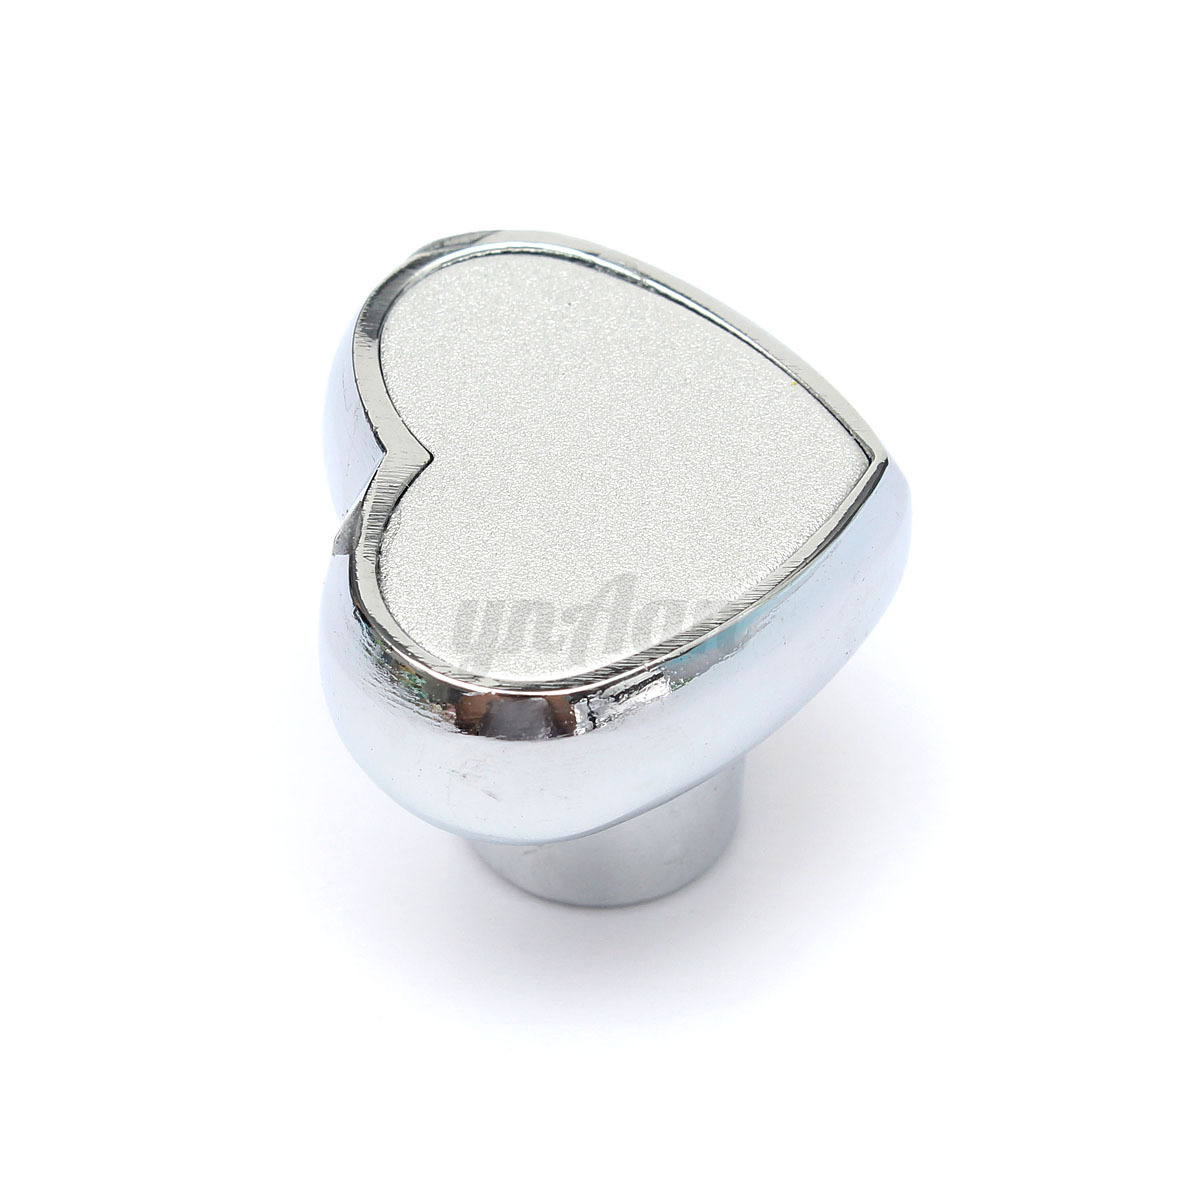 Forme c ur manche poign e bouton de porte tiroir armoire placard meuble cabinet ebay - Bouton de porte de placard ...